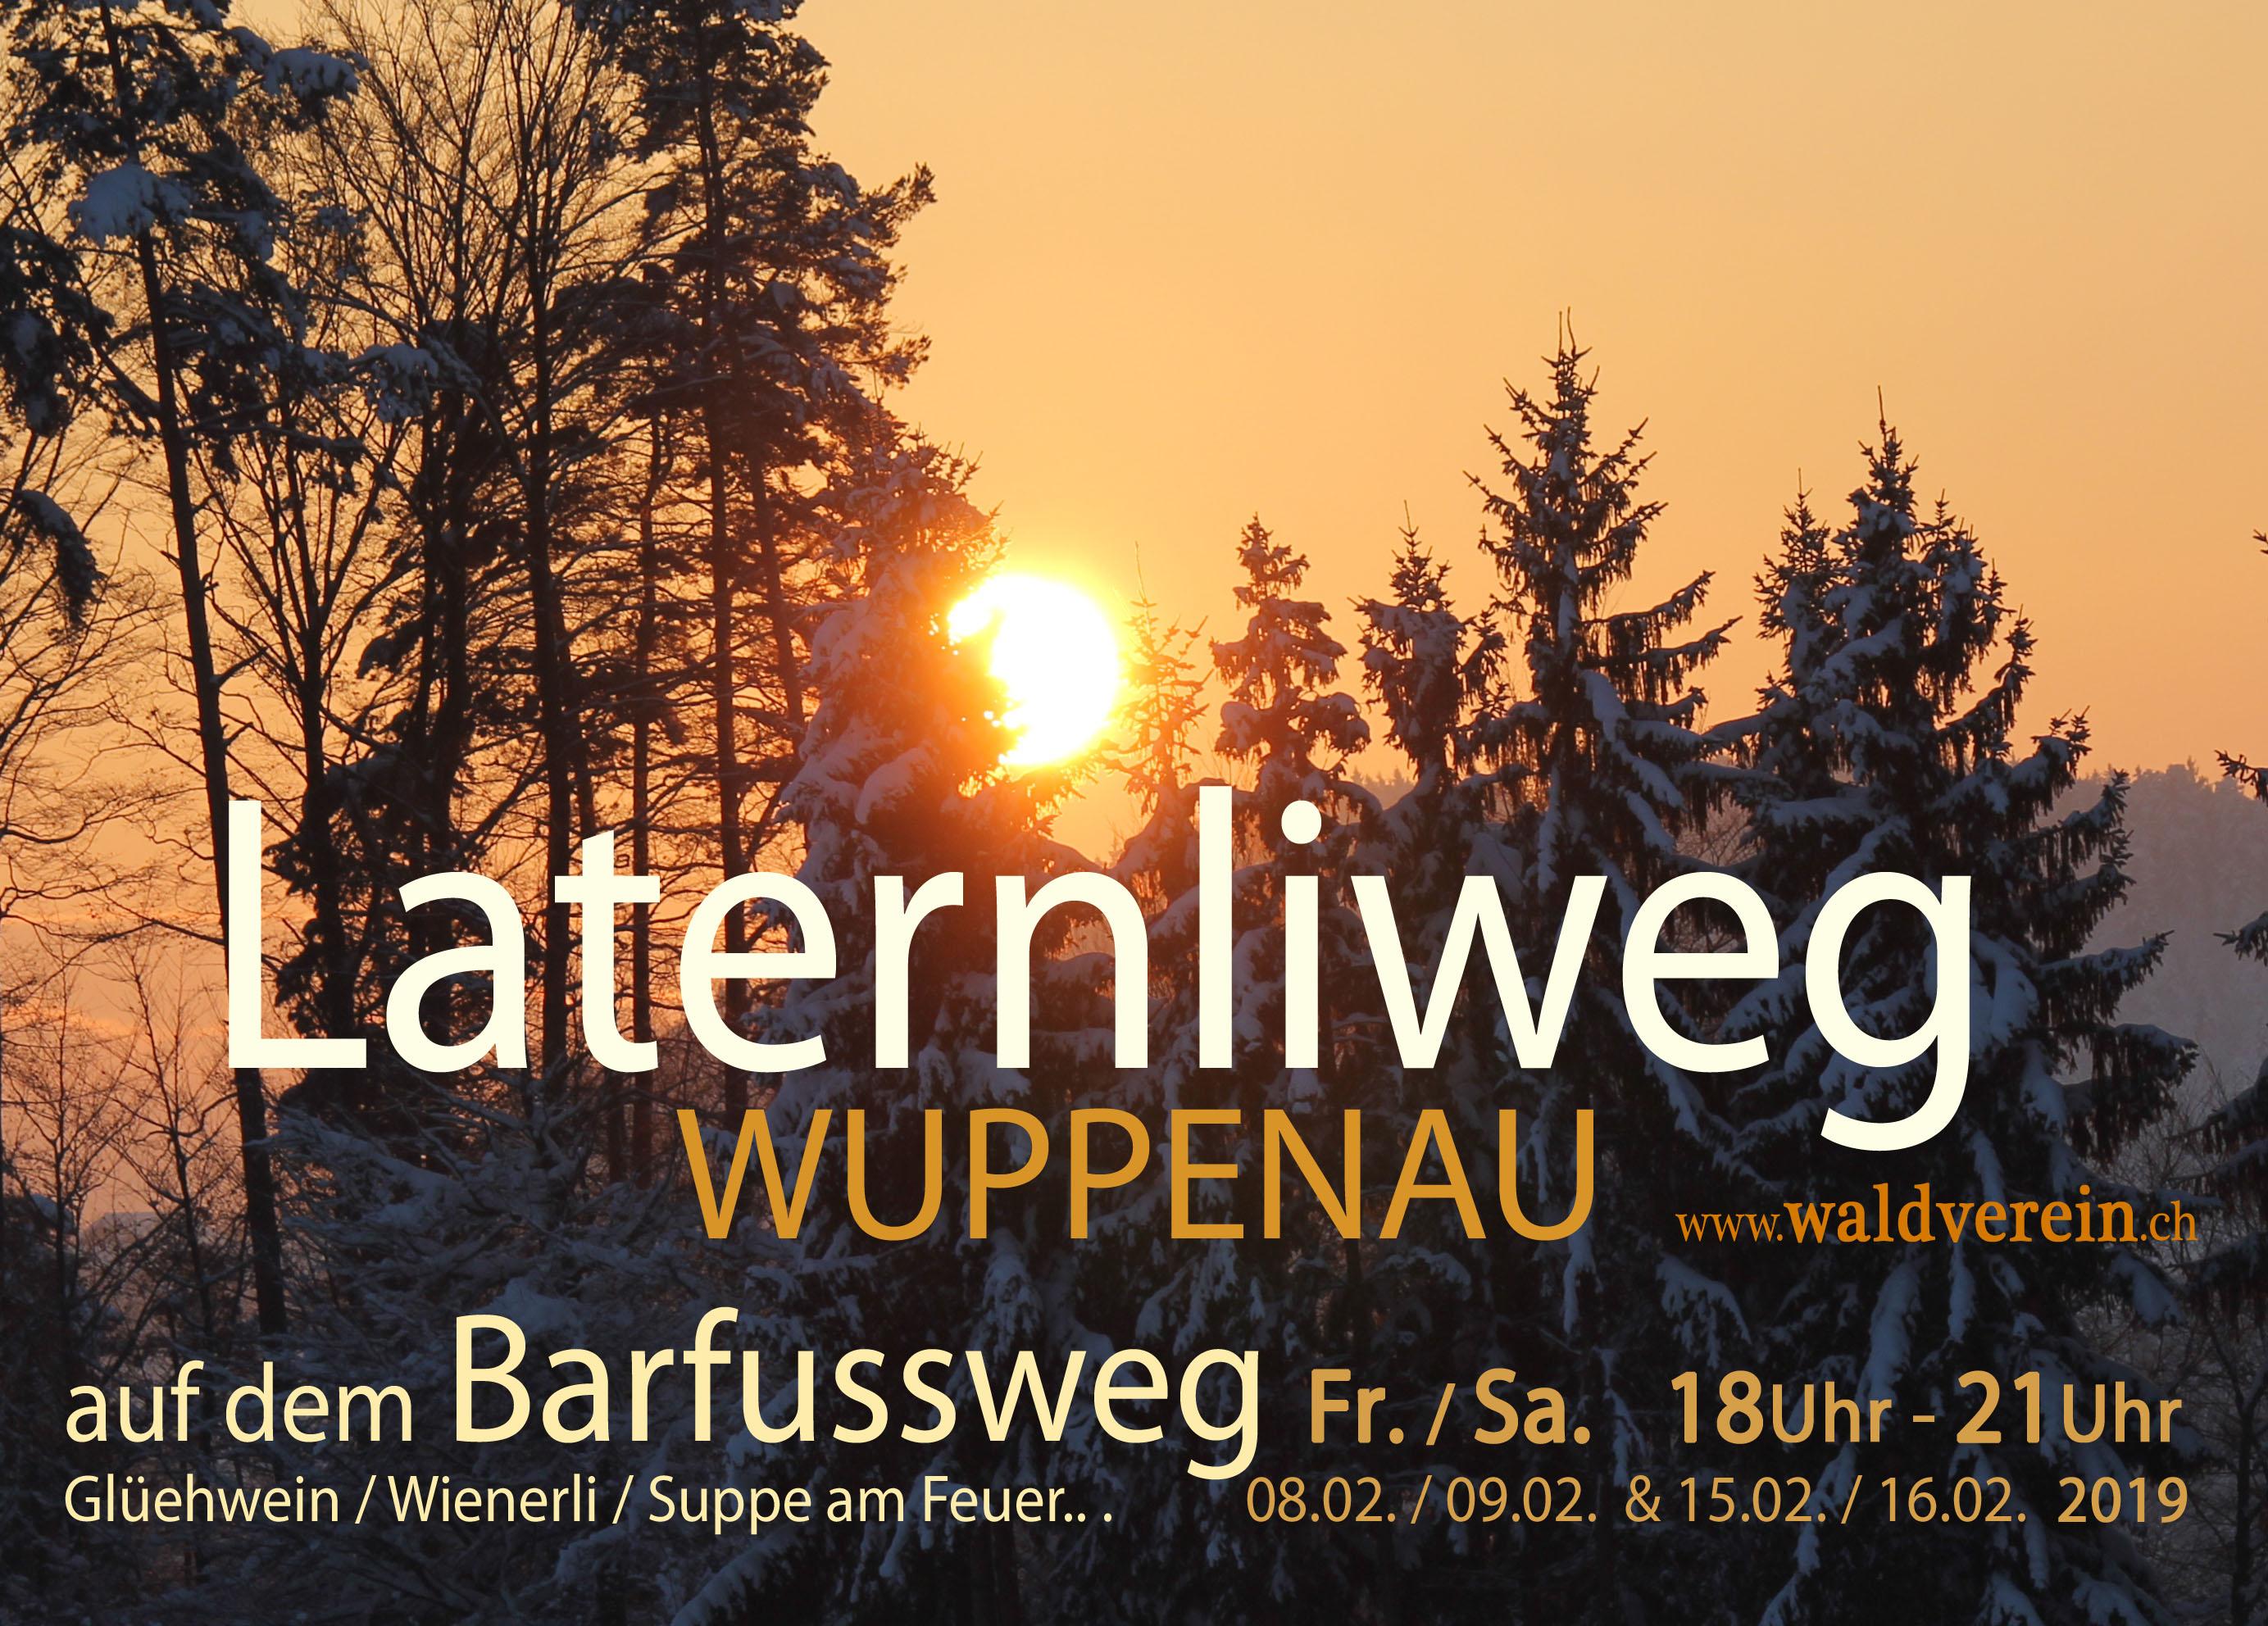 Flyer Barfussweg Laternliweg 2019 Frontseite